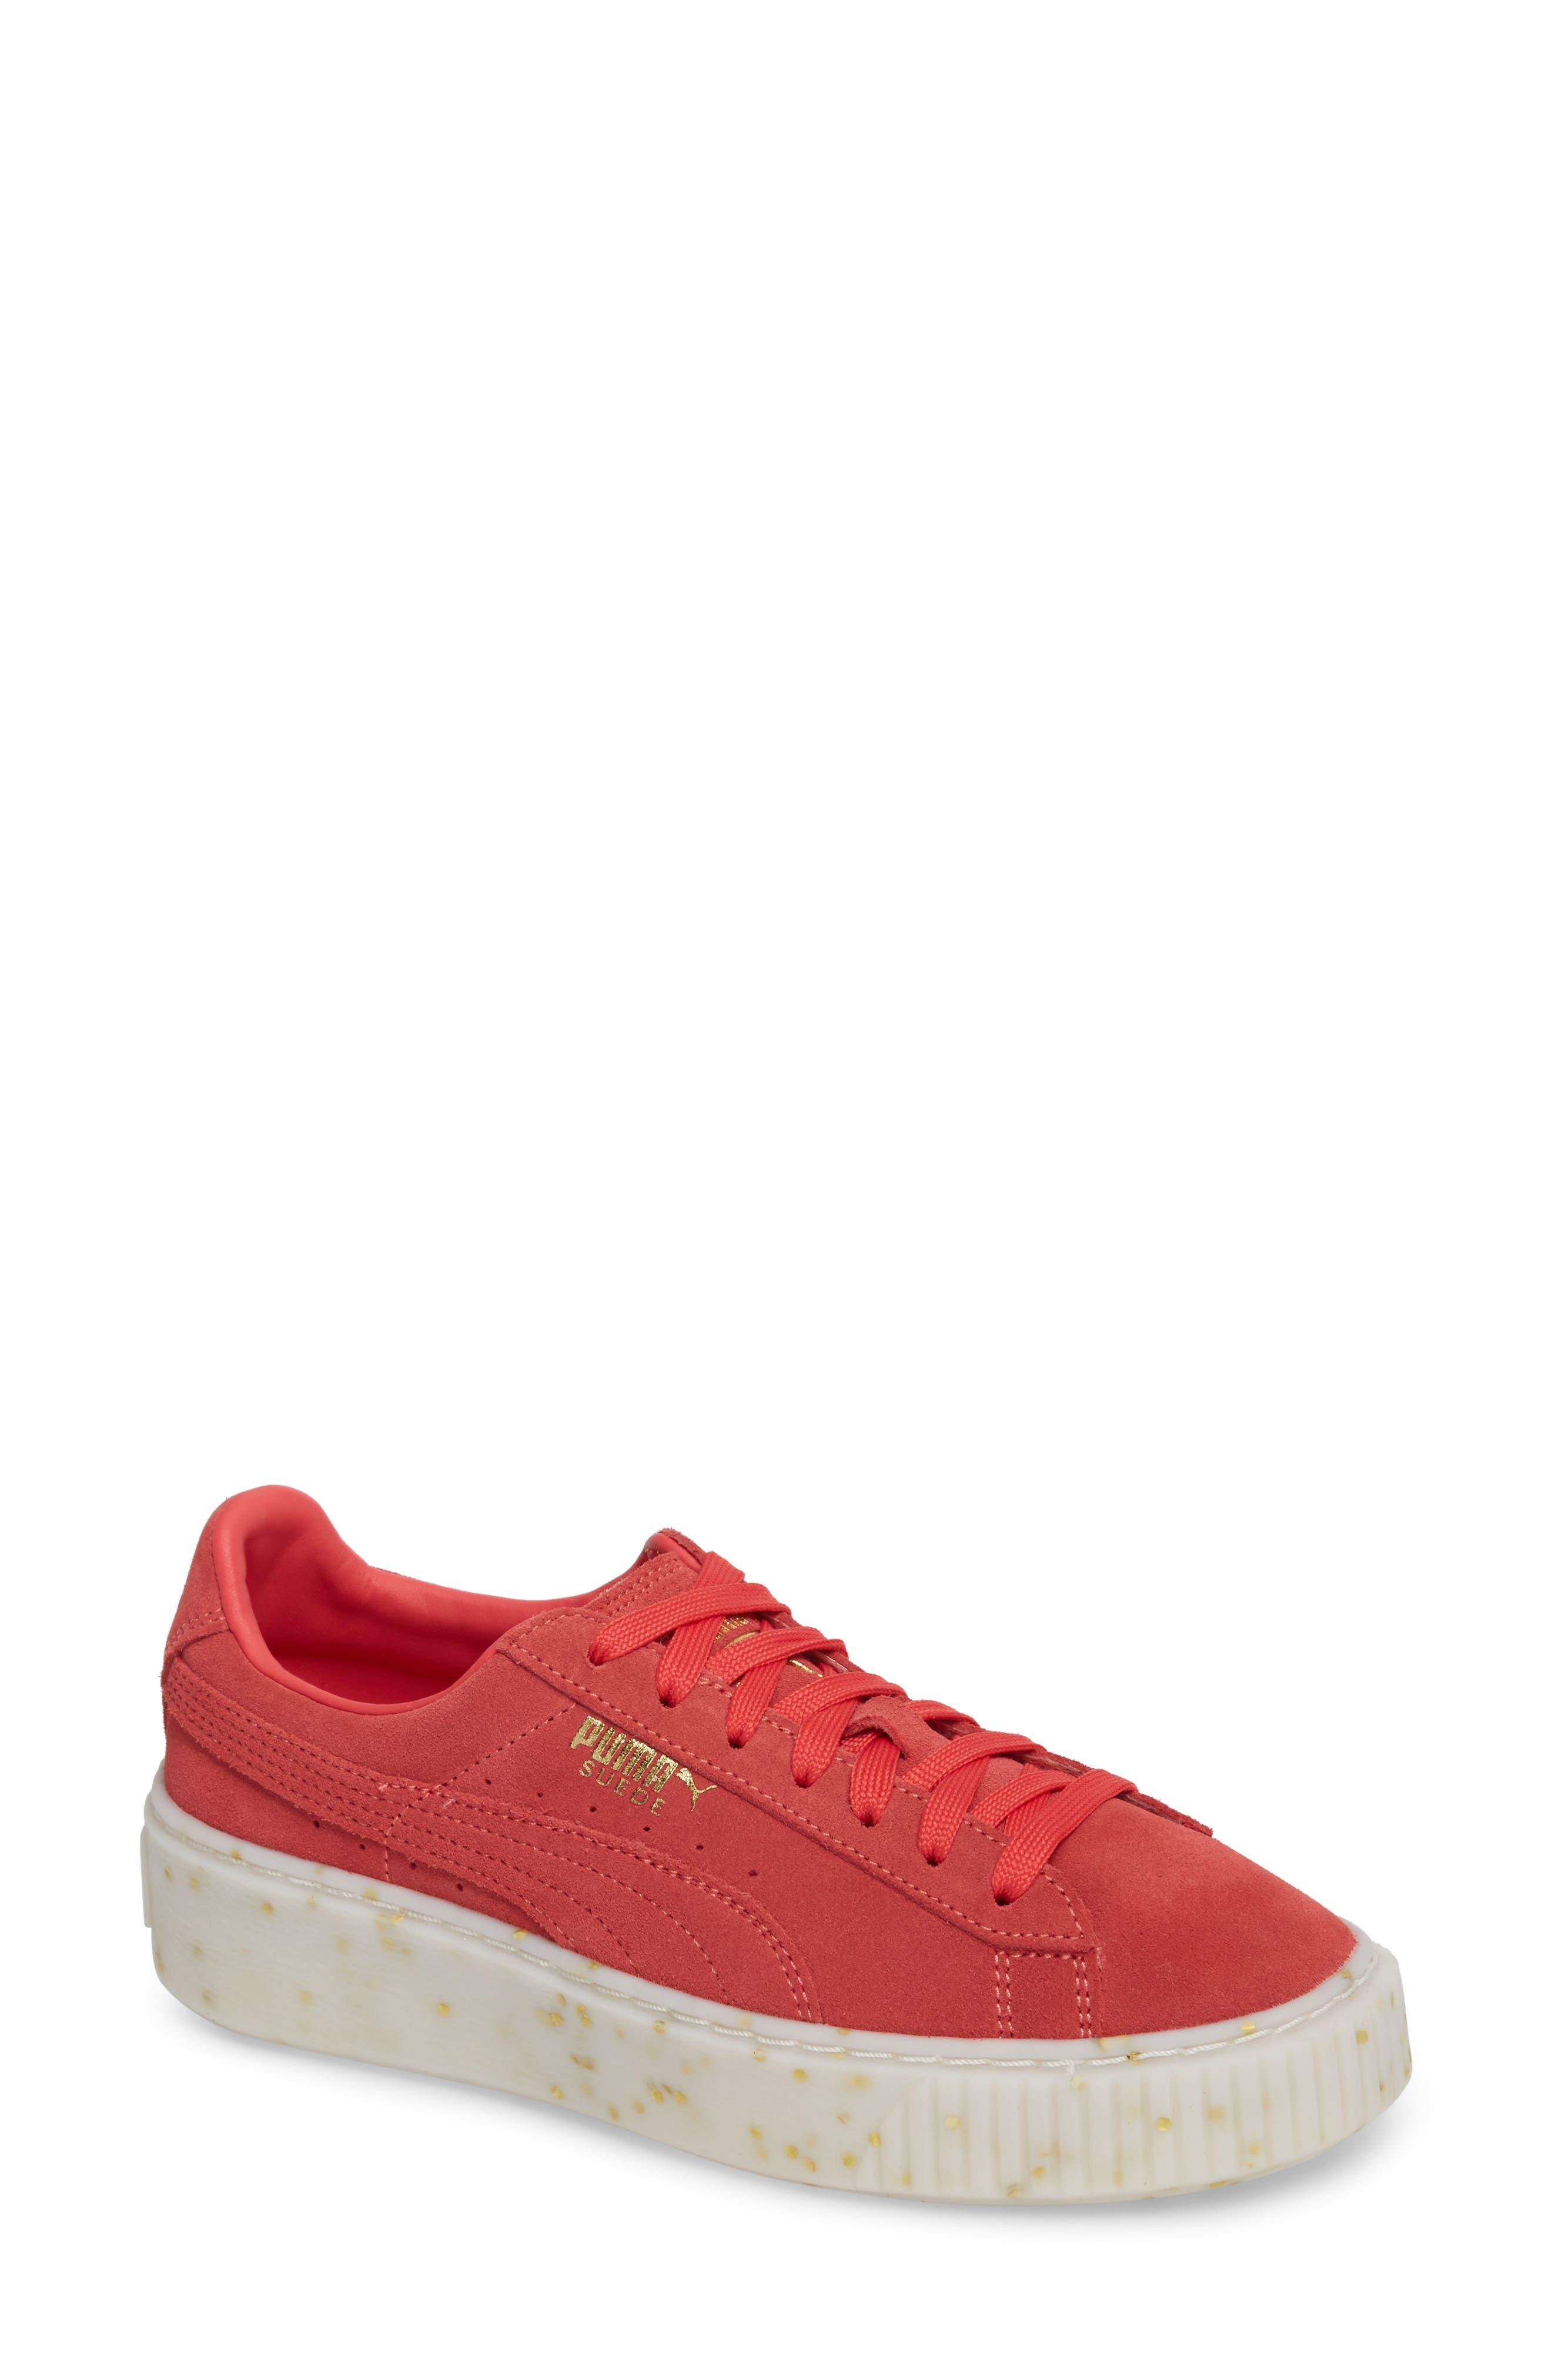 PUMA Suede Platform Sneaker, Main, color, PARADISE PINK/ TEAM GOLD